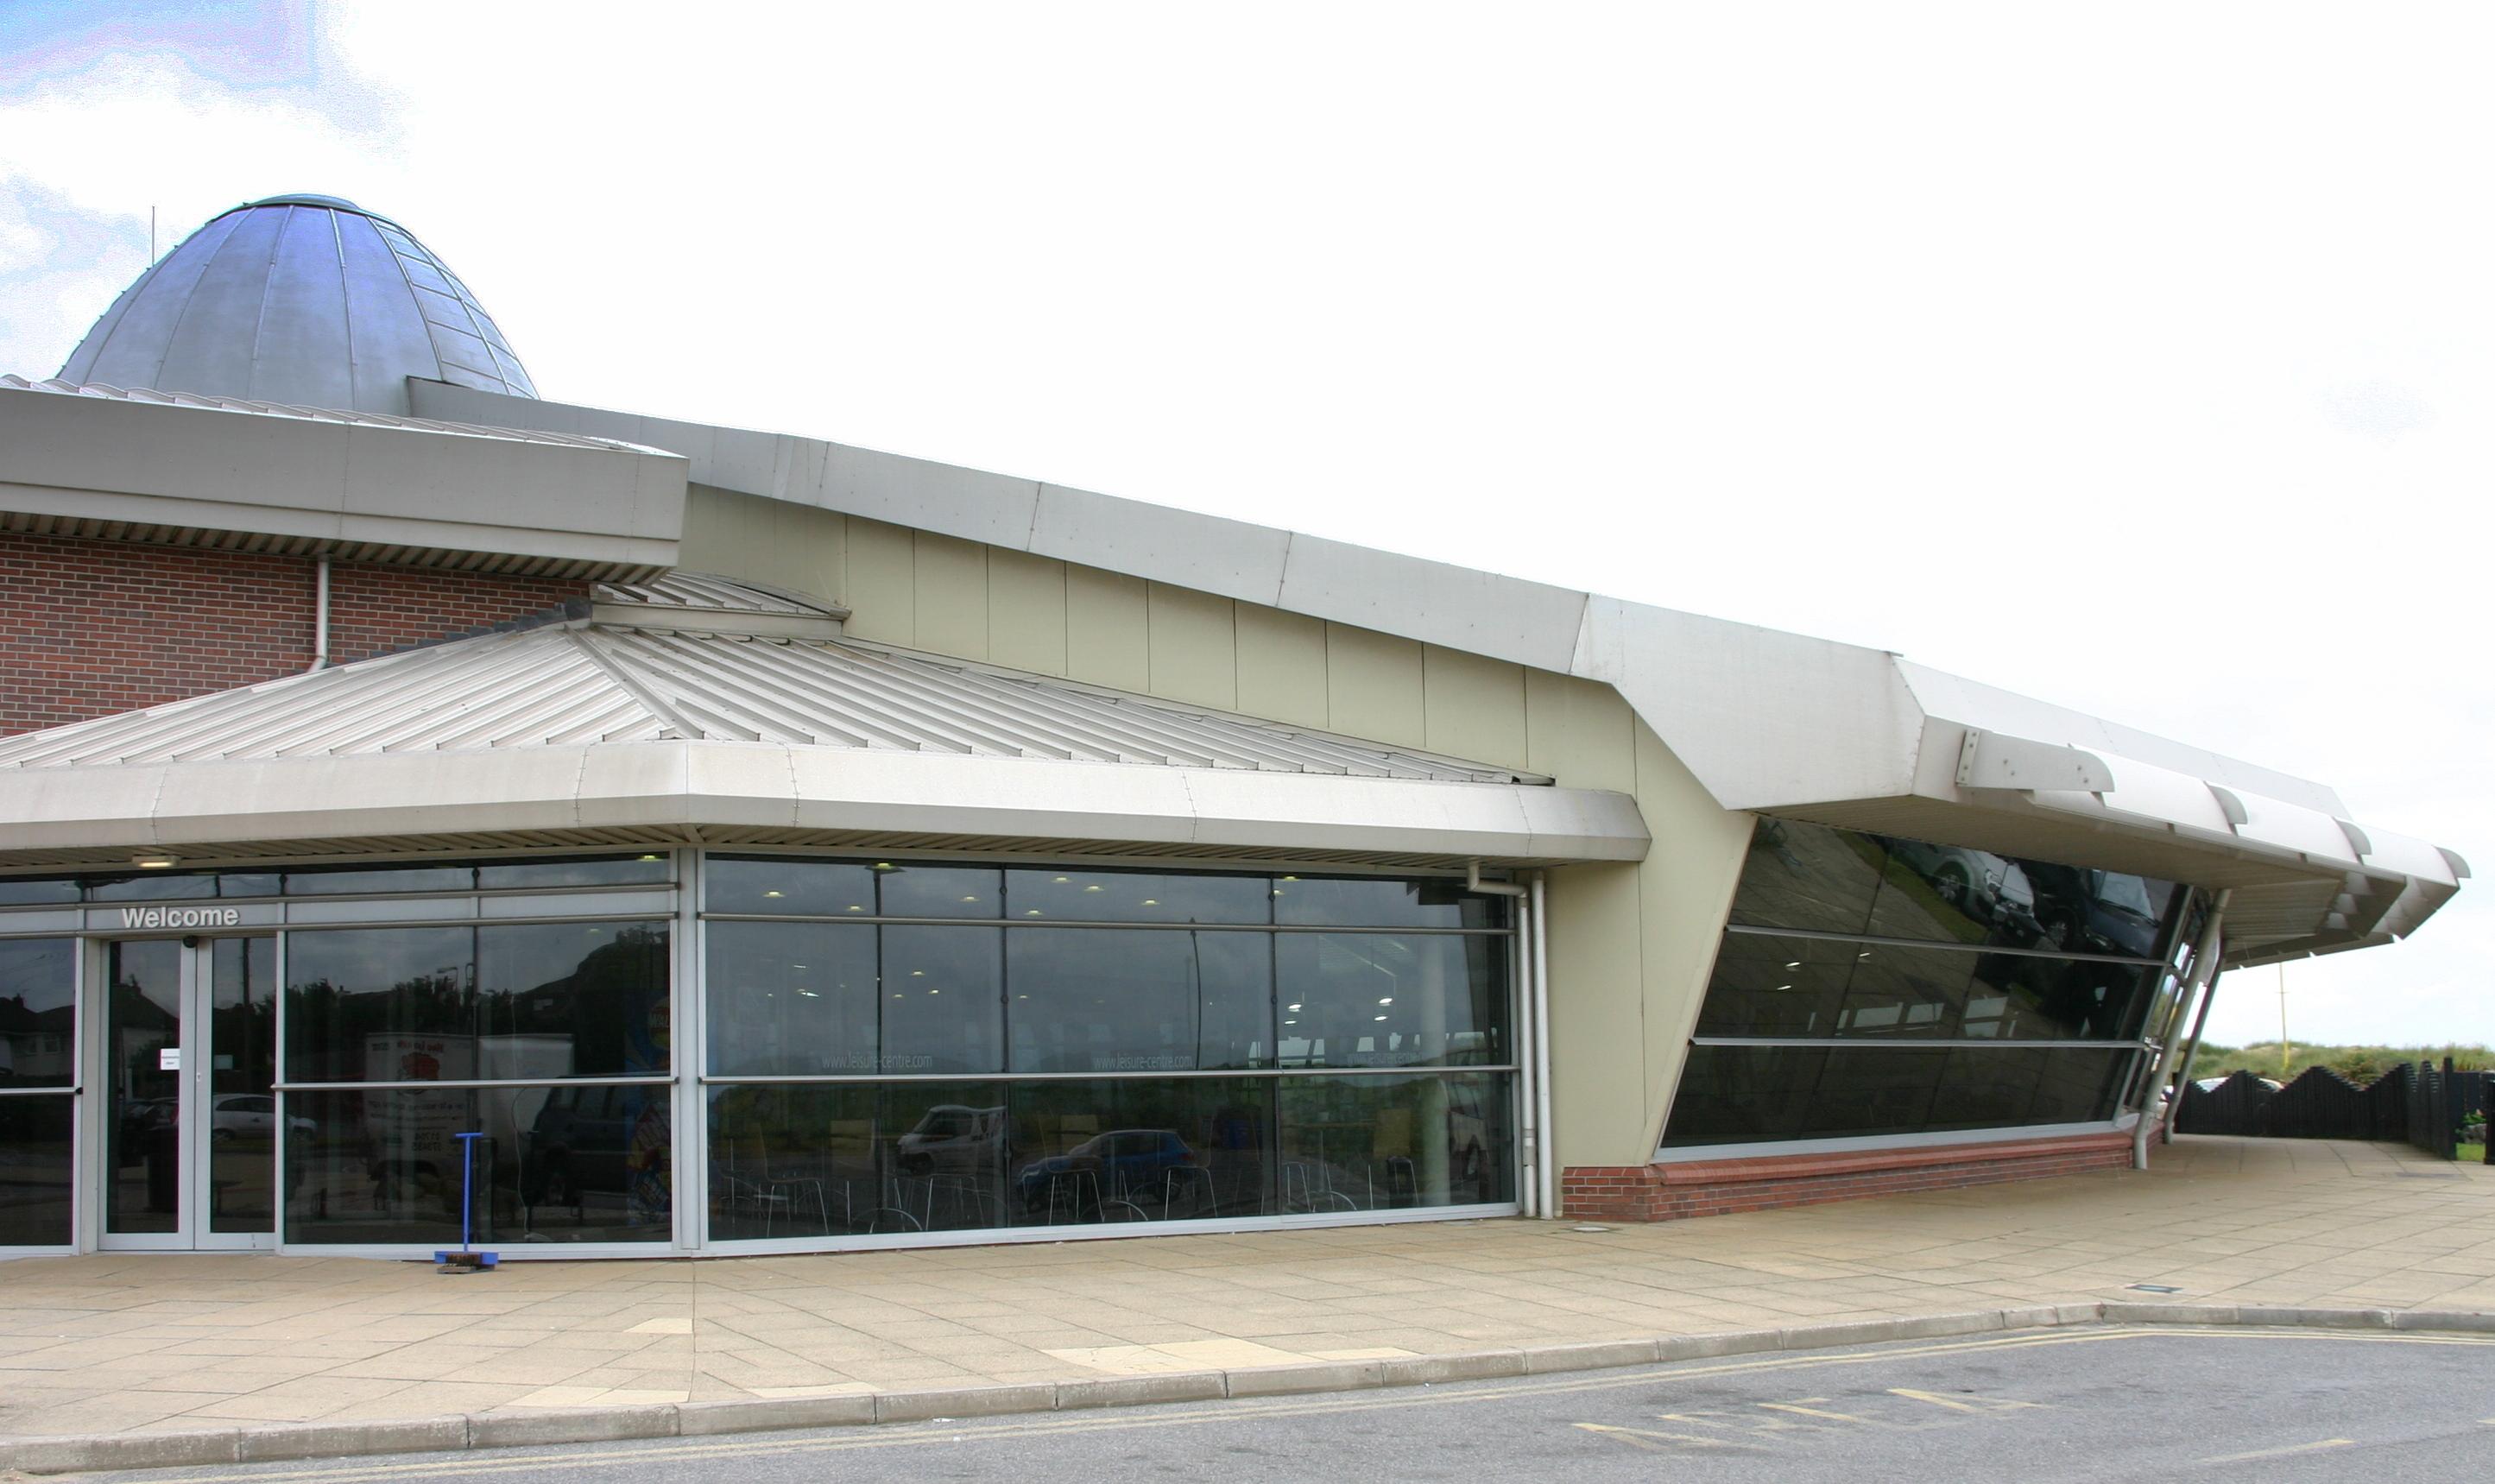 Gym, Swim, Classes and more - Oldham Community Leisure